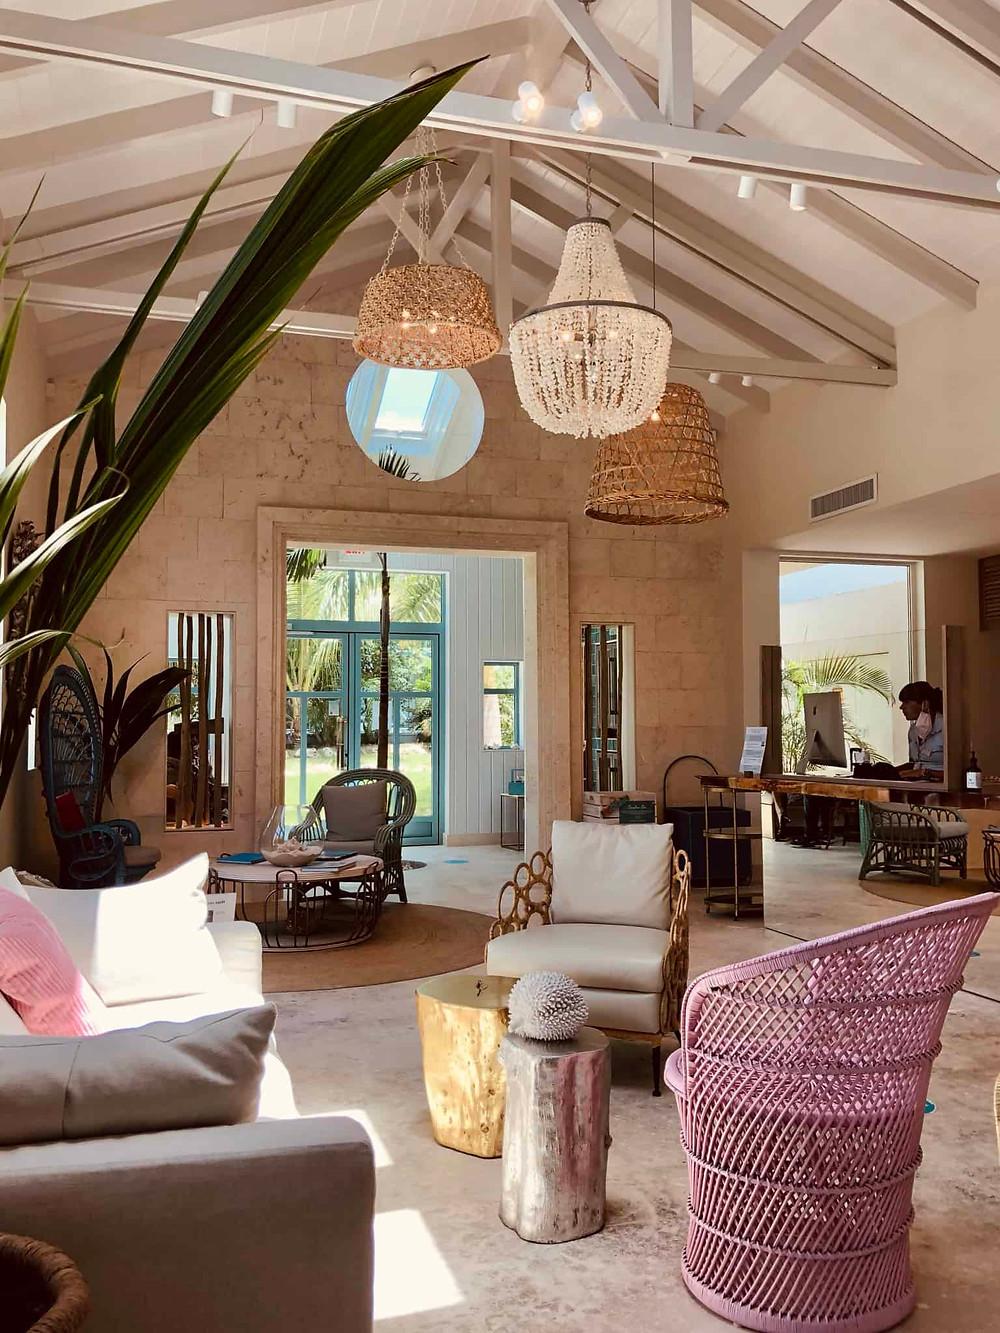 Lobby of Boardwalk Boutique Hotel in Palm Beach Aruba